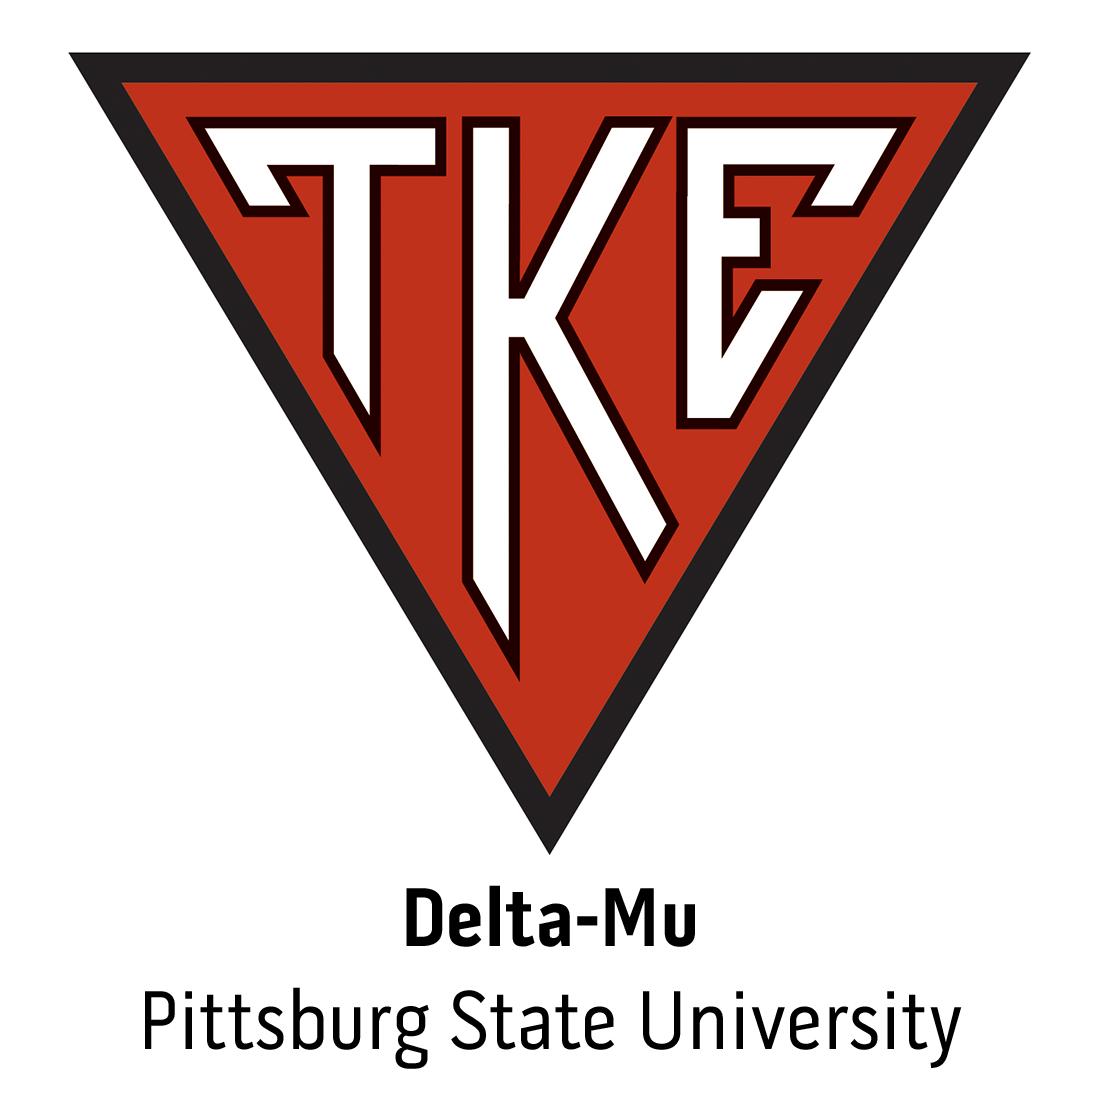 Delta-Mu Chapter at Pittsburg State University